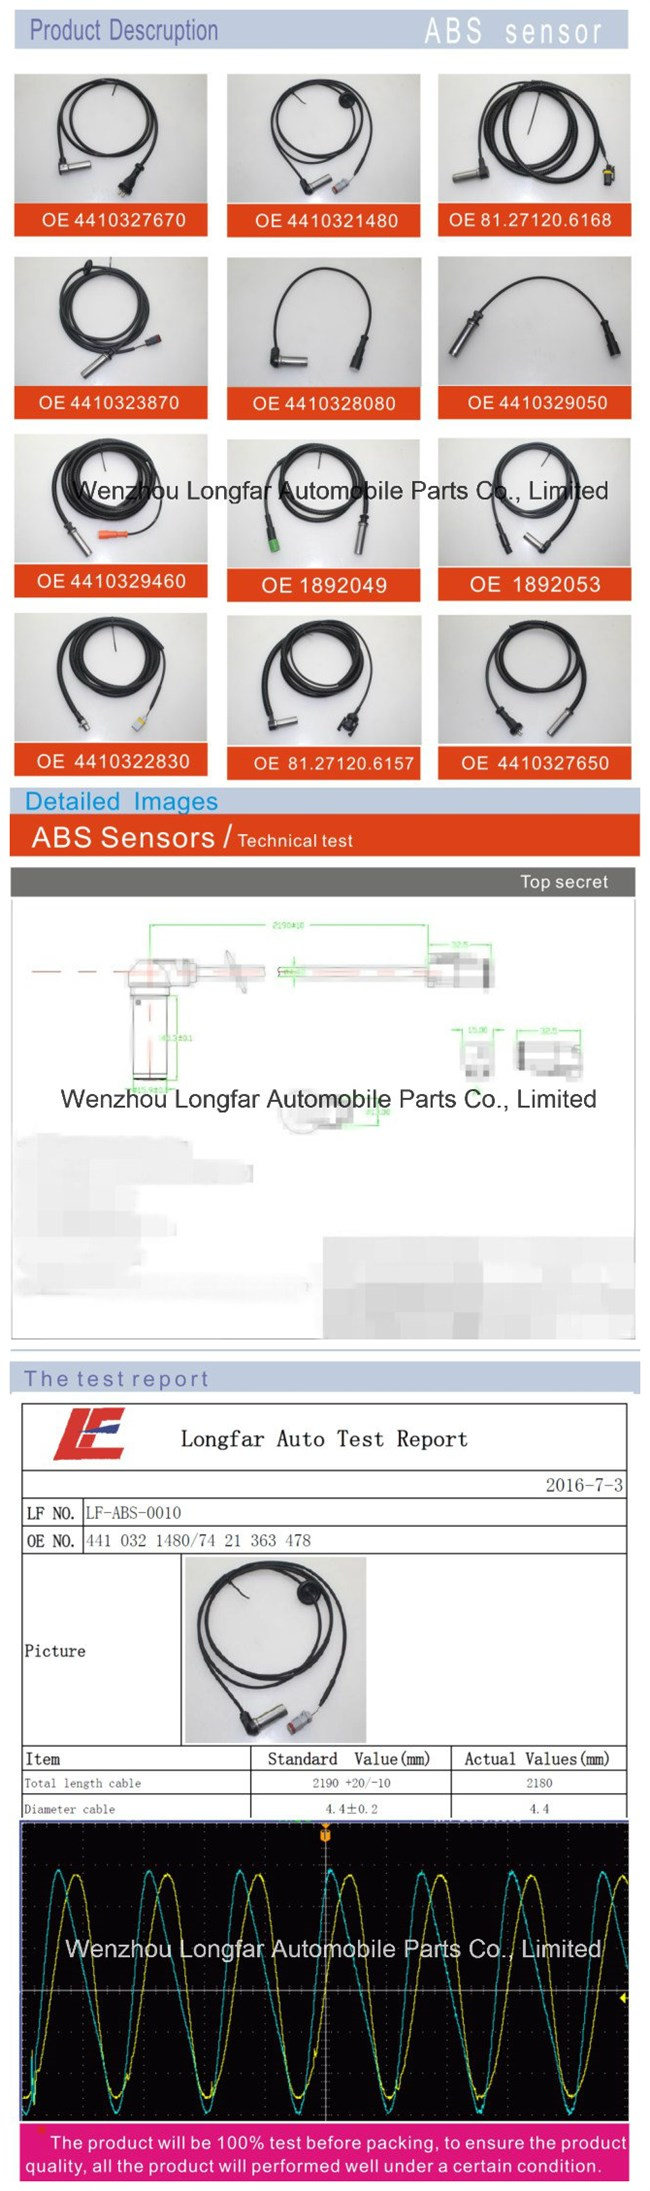 Auto Map Snesor Vehicle Manifold Absolute Pressure Transducer Indicator Sensor 37830pgka01,Su5585,16006834,12581972 for Honda,Wells,Opel,Vauxhall,Standard